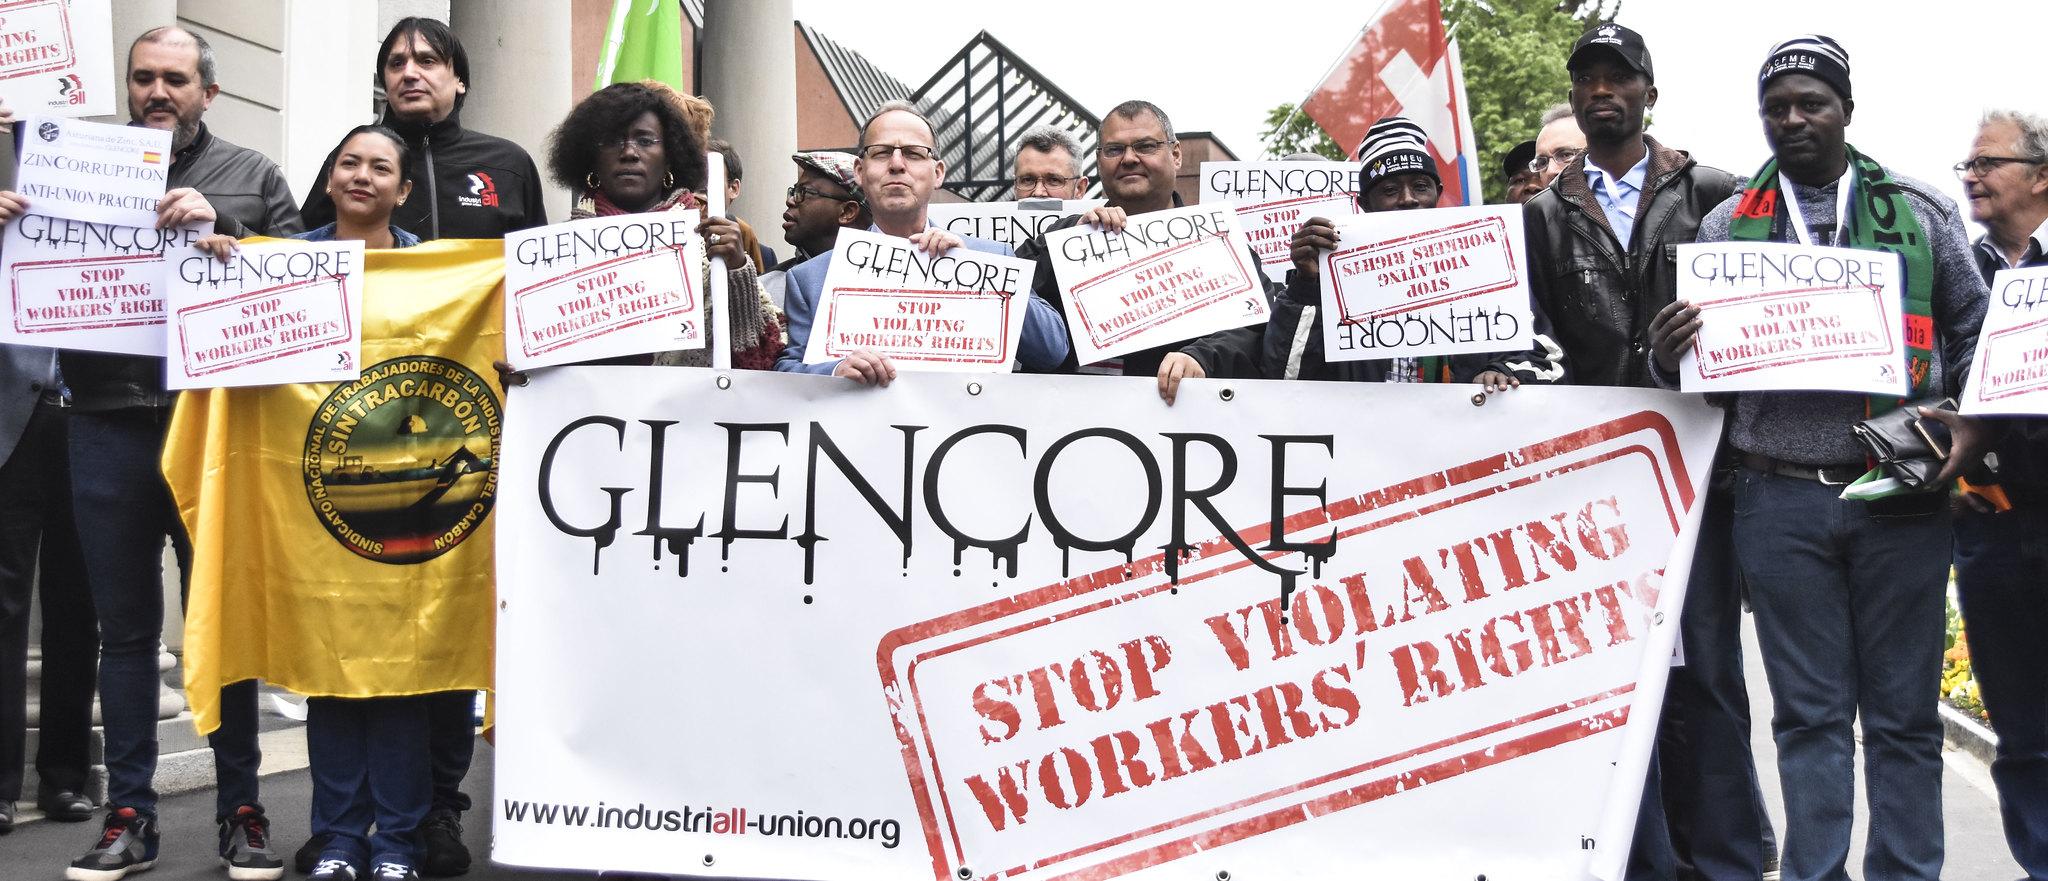 Arbeiter demonstrieren gegen Arbeitsrechtsverletzungen